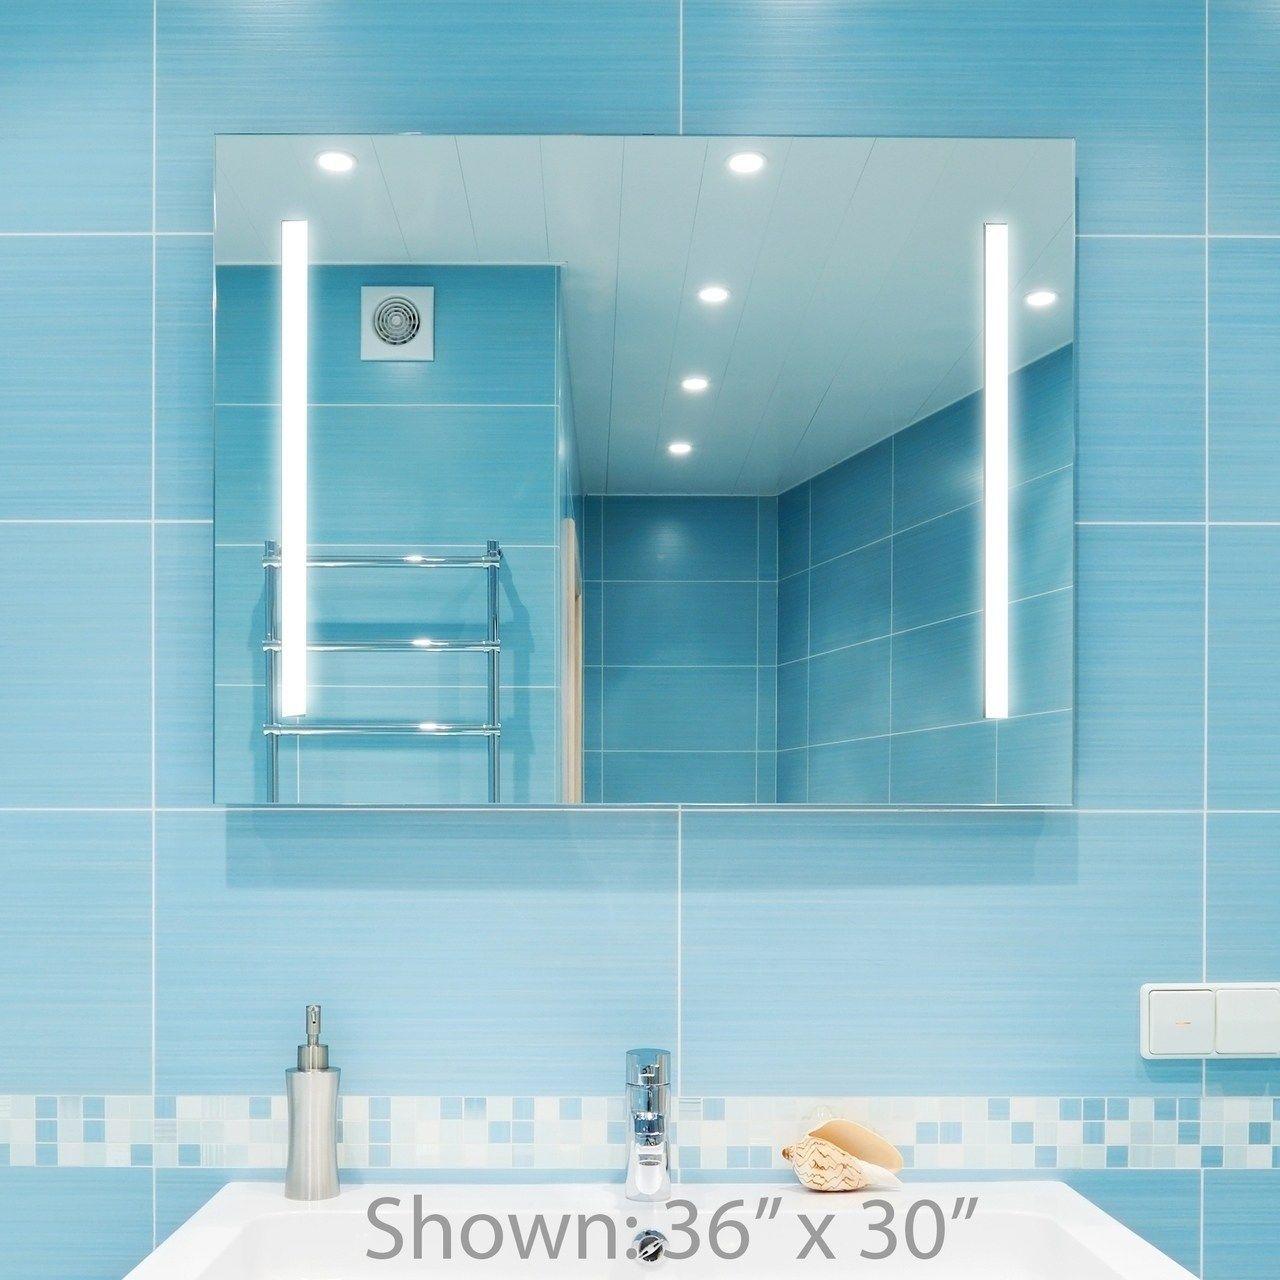 Dyconn Faucet Catella Wall Mounted Vanity Bathroom Led Backlit Mirror 30x36 Clear Wall Moun Modern Bathroom Mirrors Bathroom Vanity Mirror Bathroom Mirror [ 1280 x 1280 Pixel ]